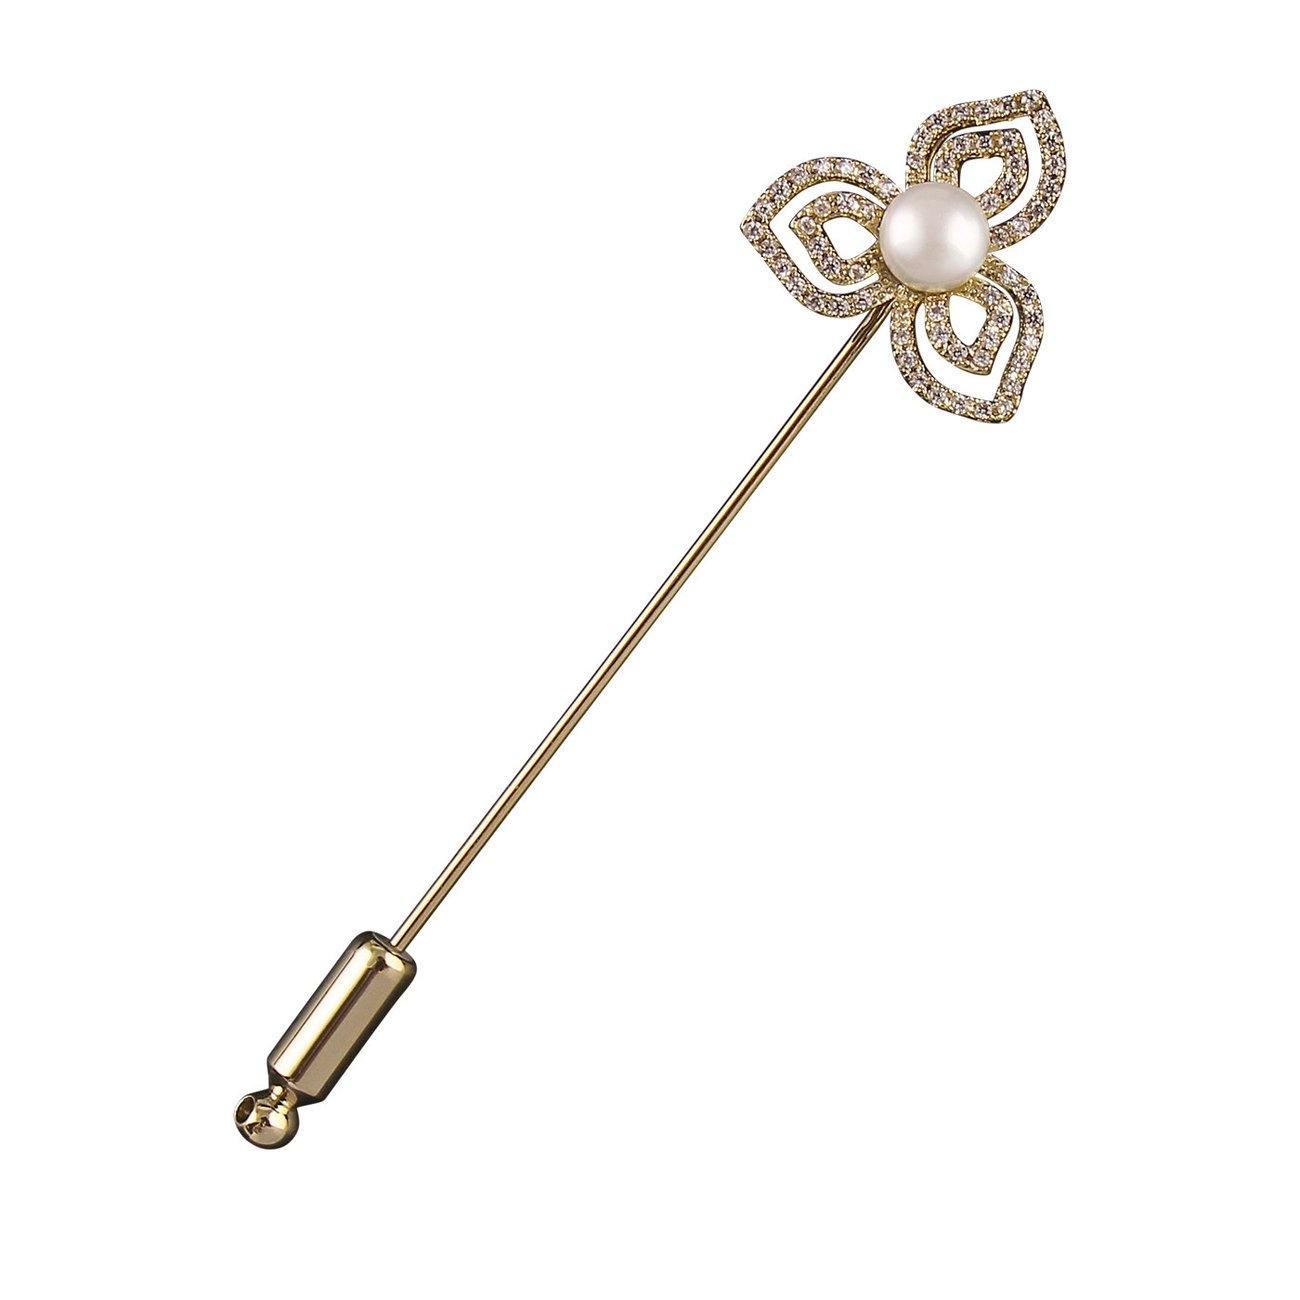 BUSSE Plastronnadel Floral, Länge: 70 mm - gold (Kristall-Perle)